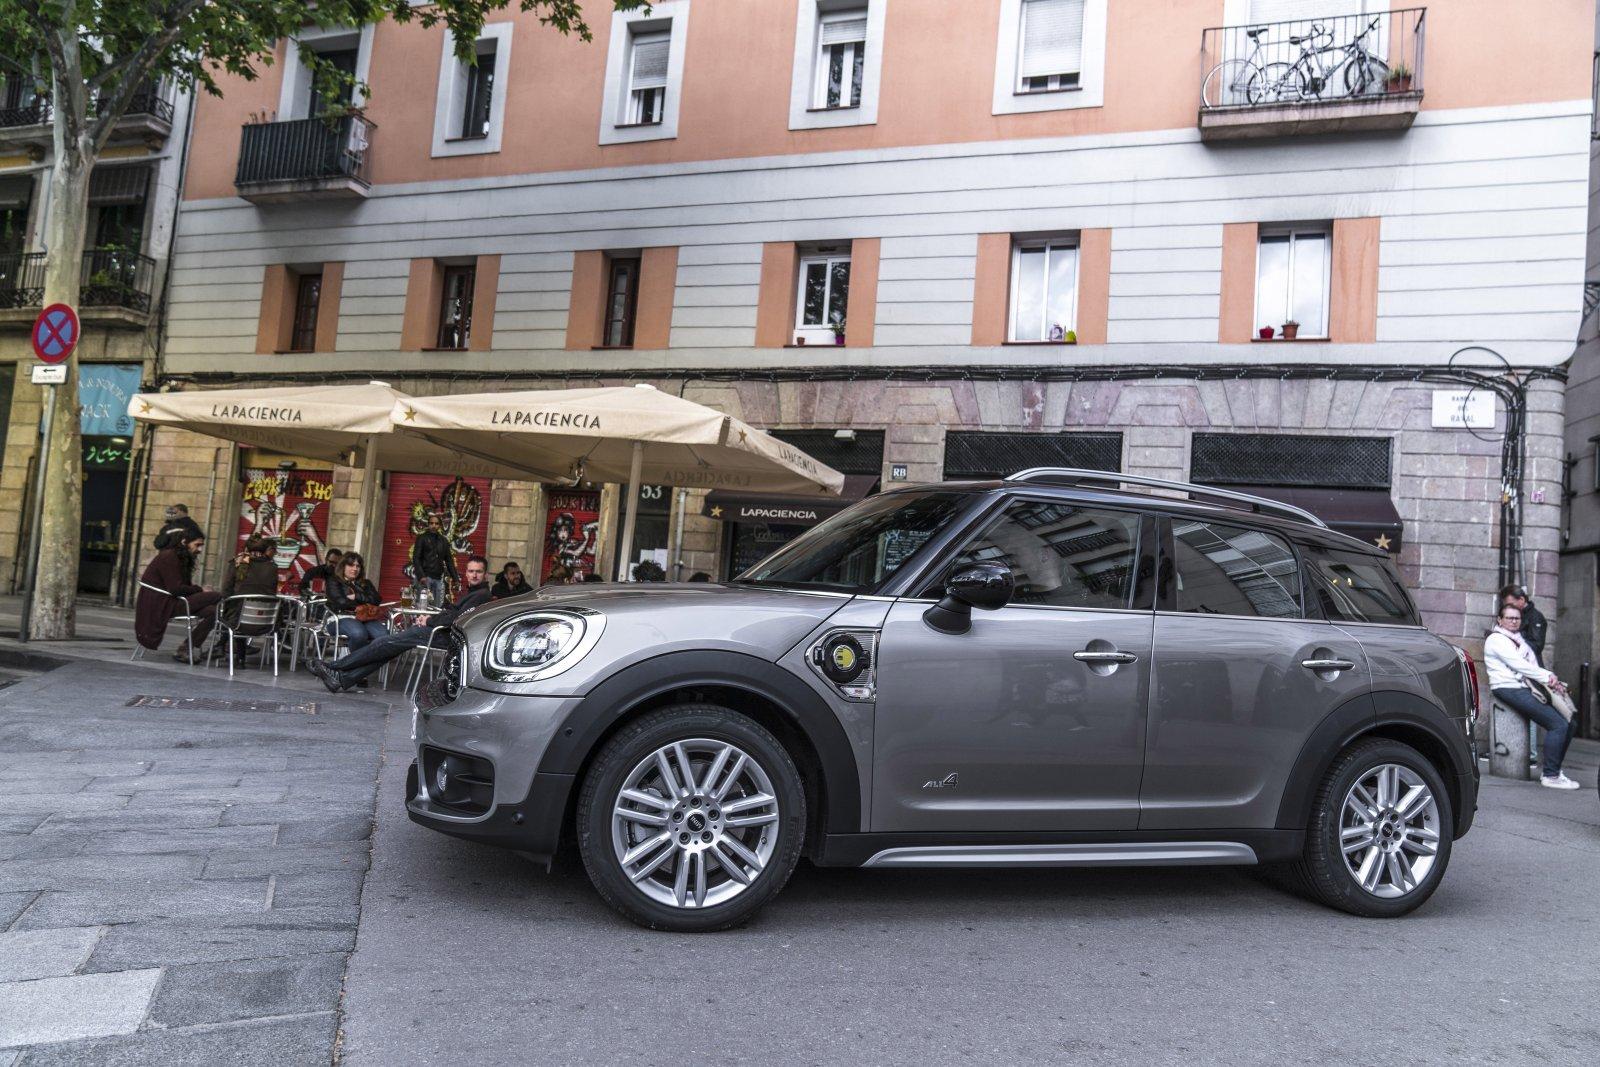 Niedlich Mini Cooper S Schaltplan Zeitgenössisch - Verdrahtungsideen ...